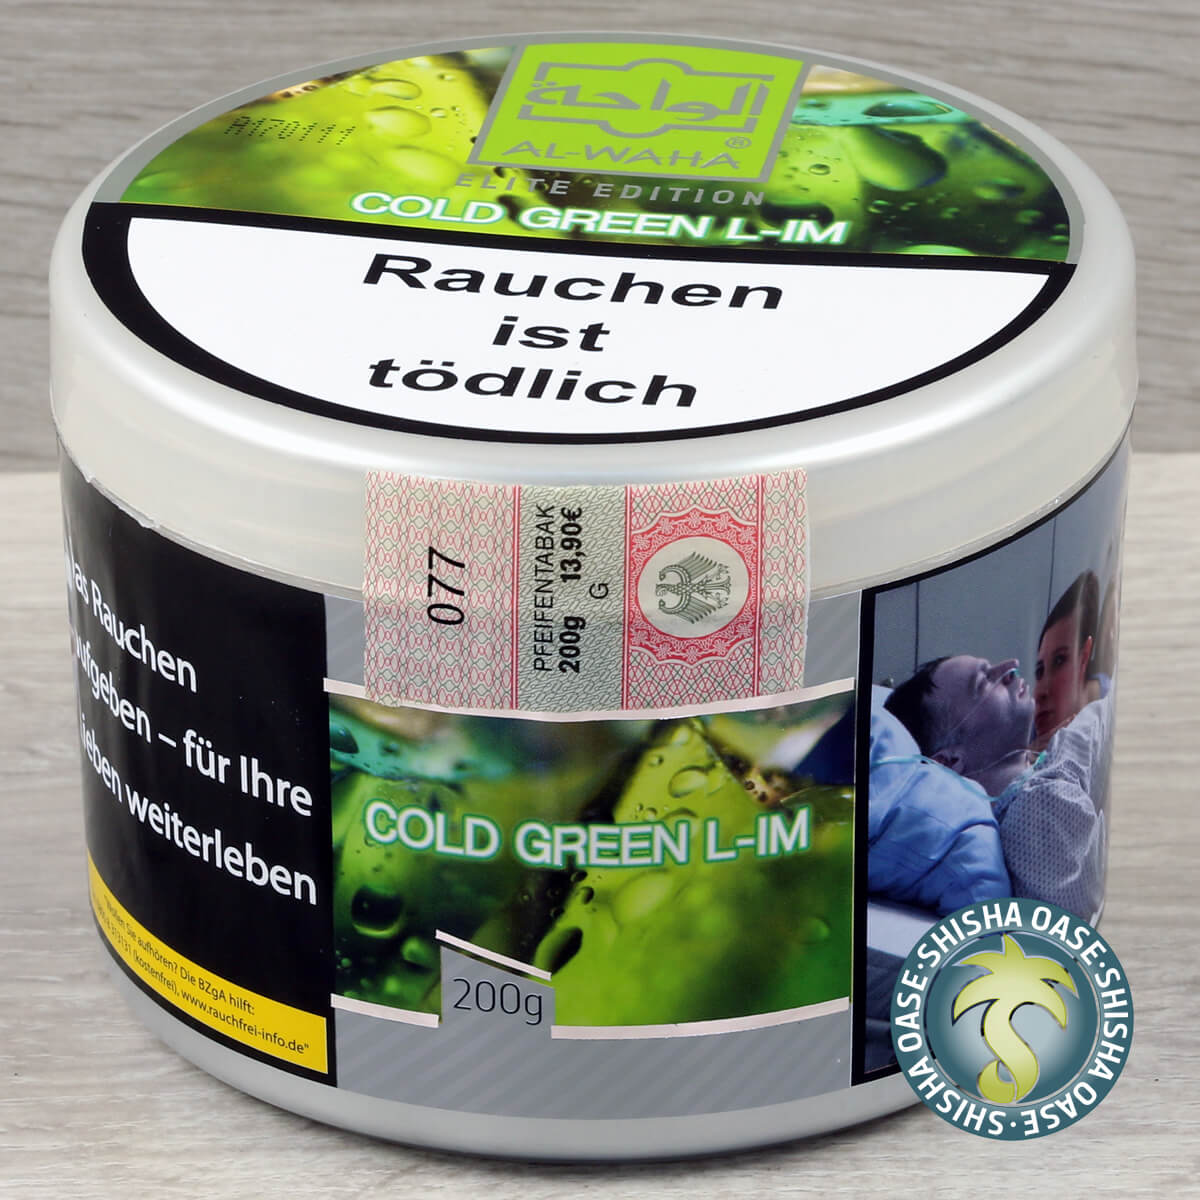 Al Waha Cold Green L-IM 200g Dose - rauchfertig